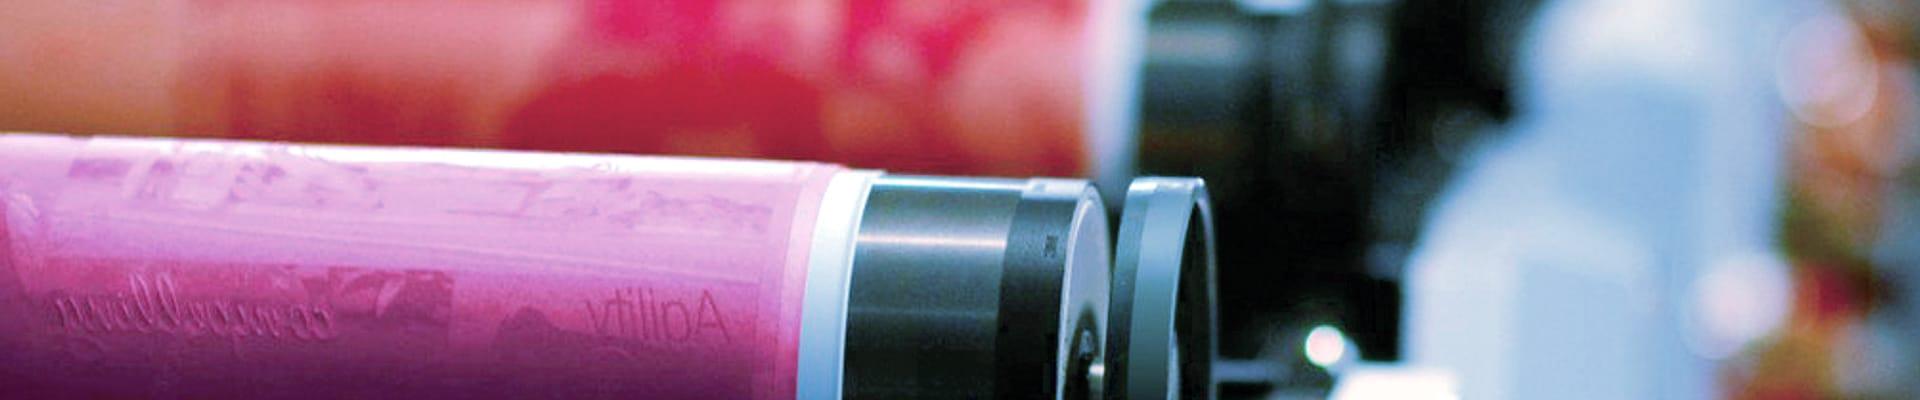 Dupont Cyrel flexographic printing plates